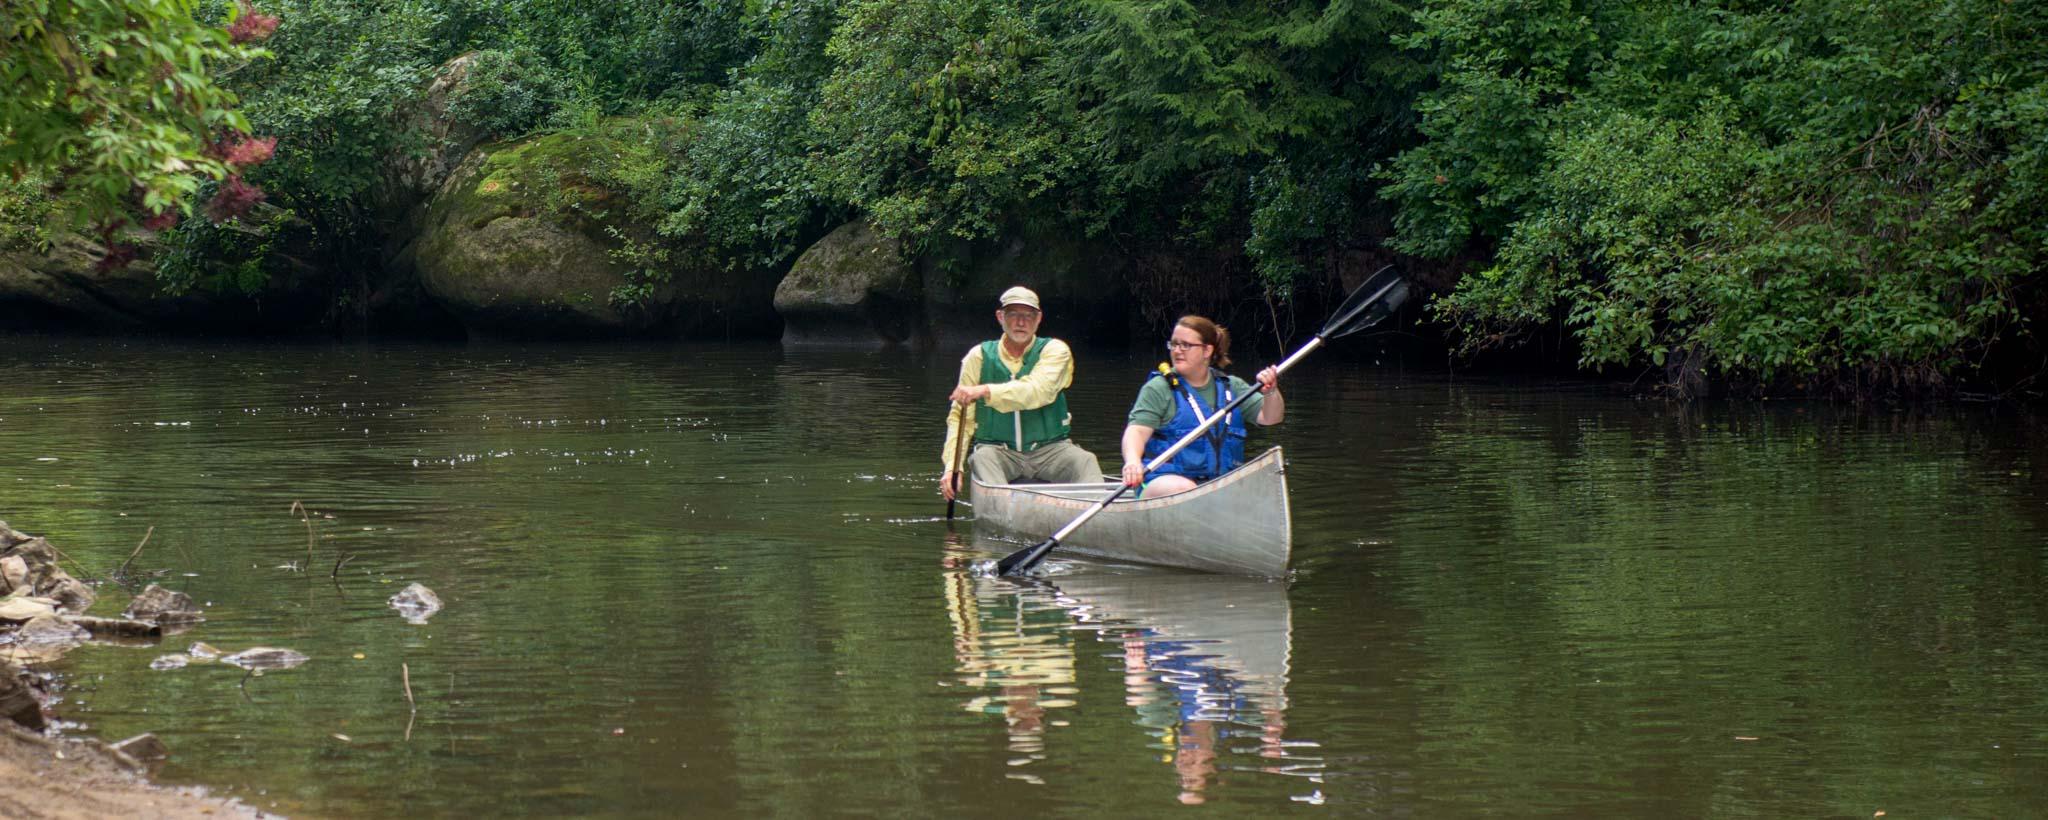 Canoeing on Bear Creek